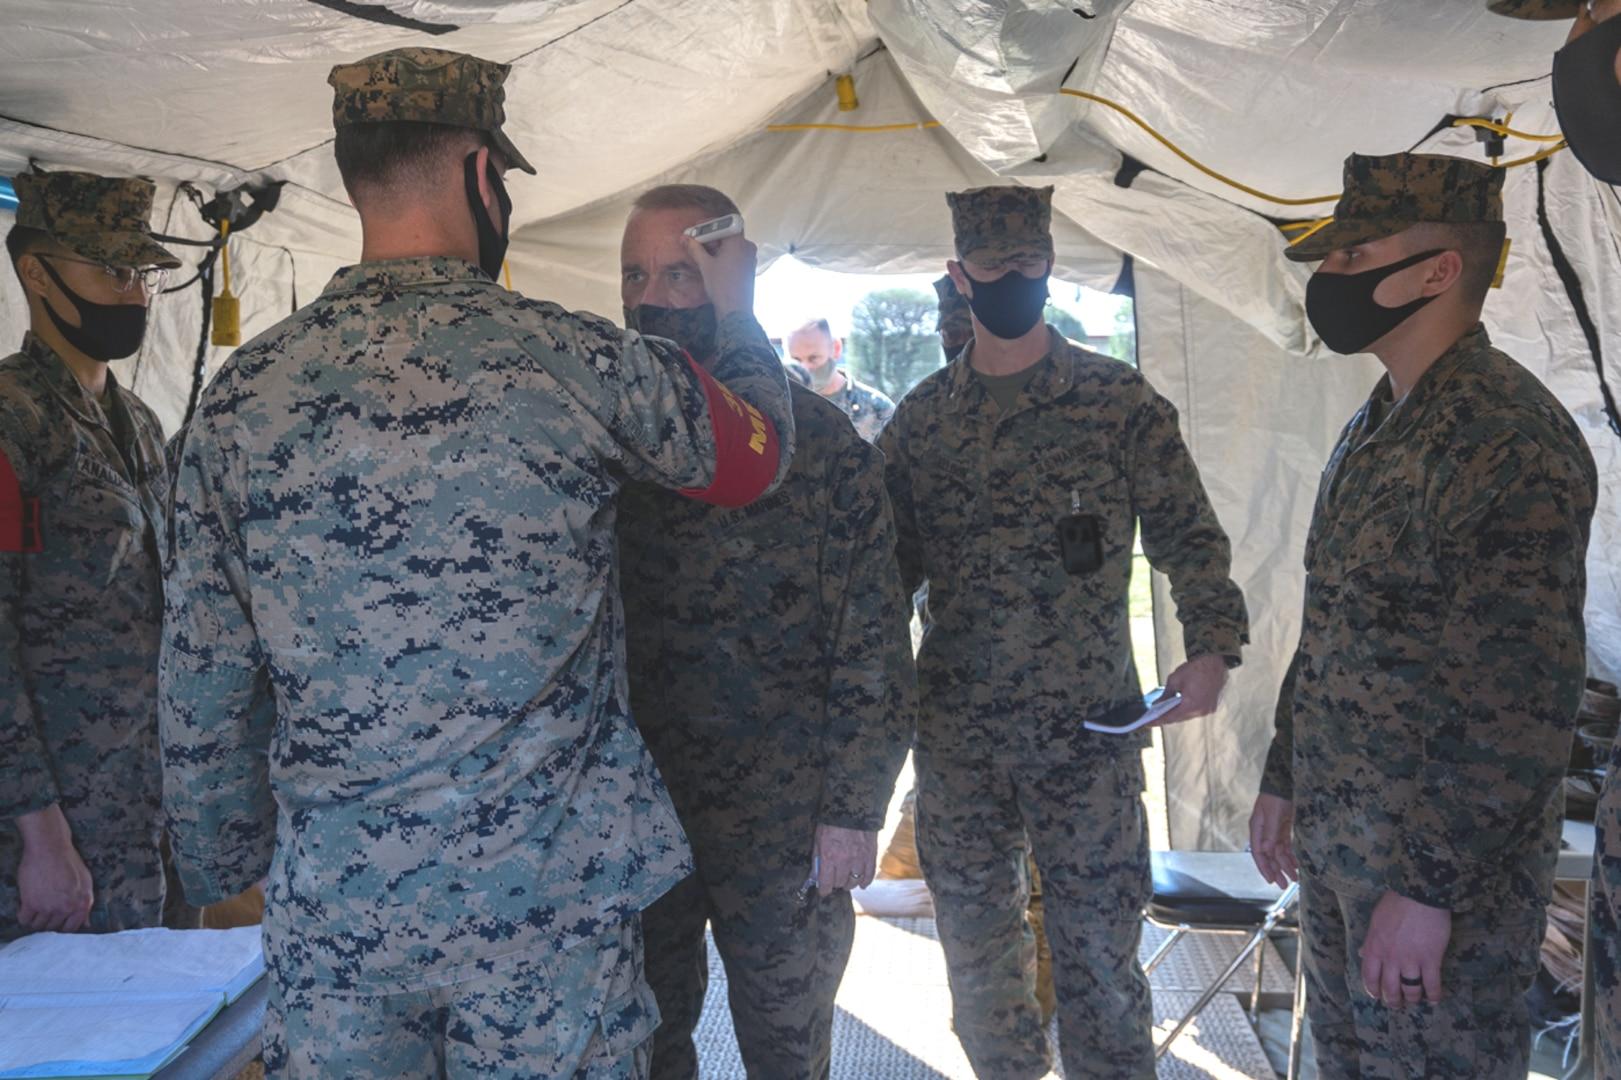 Marines from 1st MAW participate in Yama Sakura 79